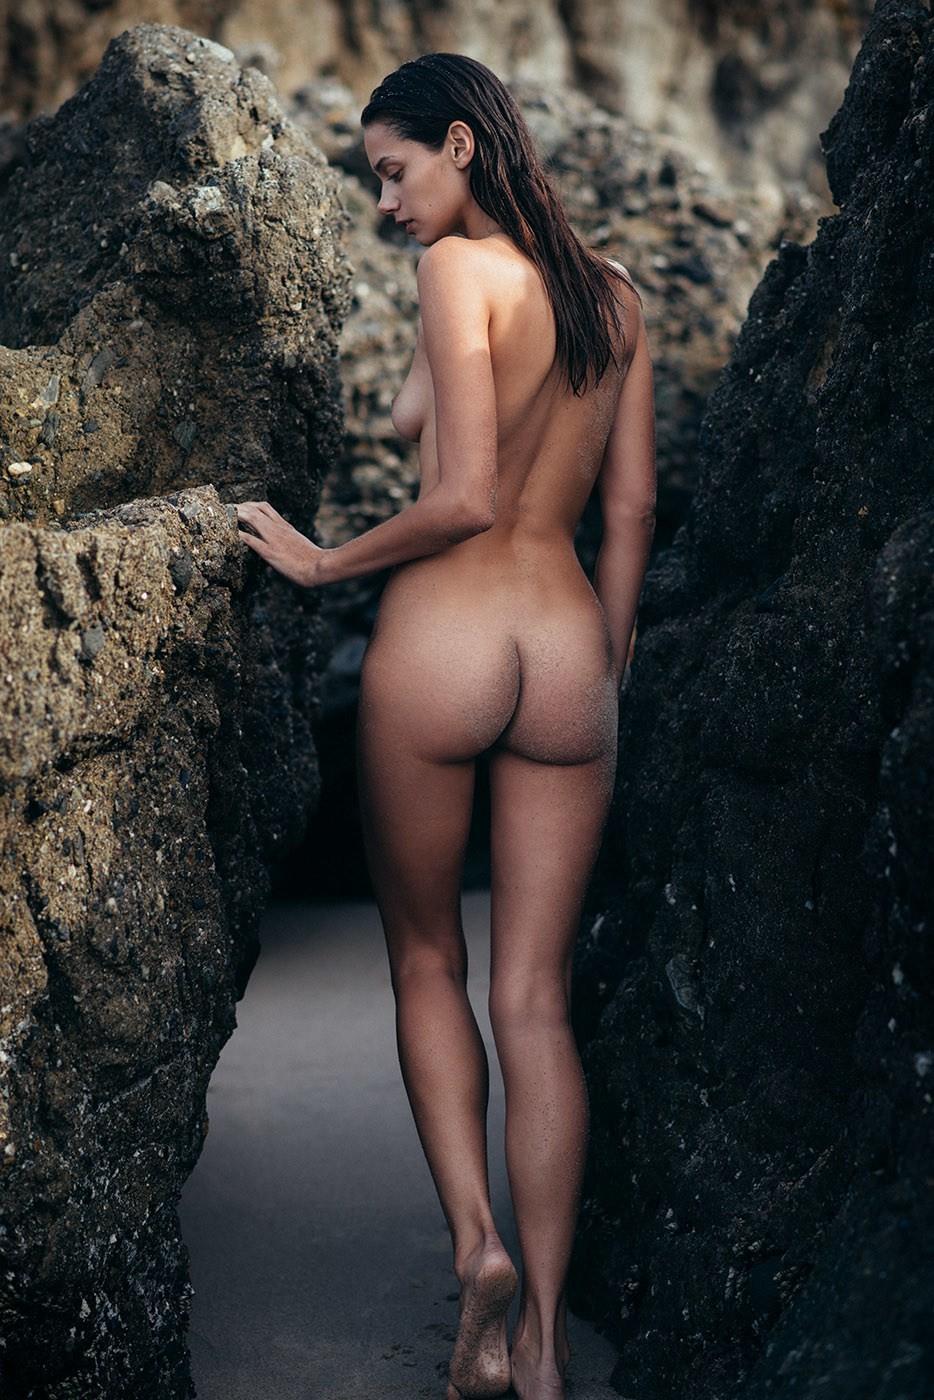 Michelle nude